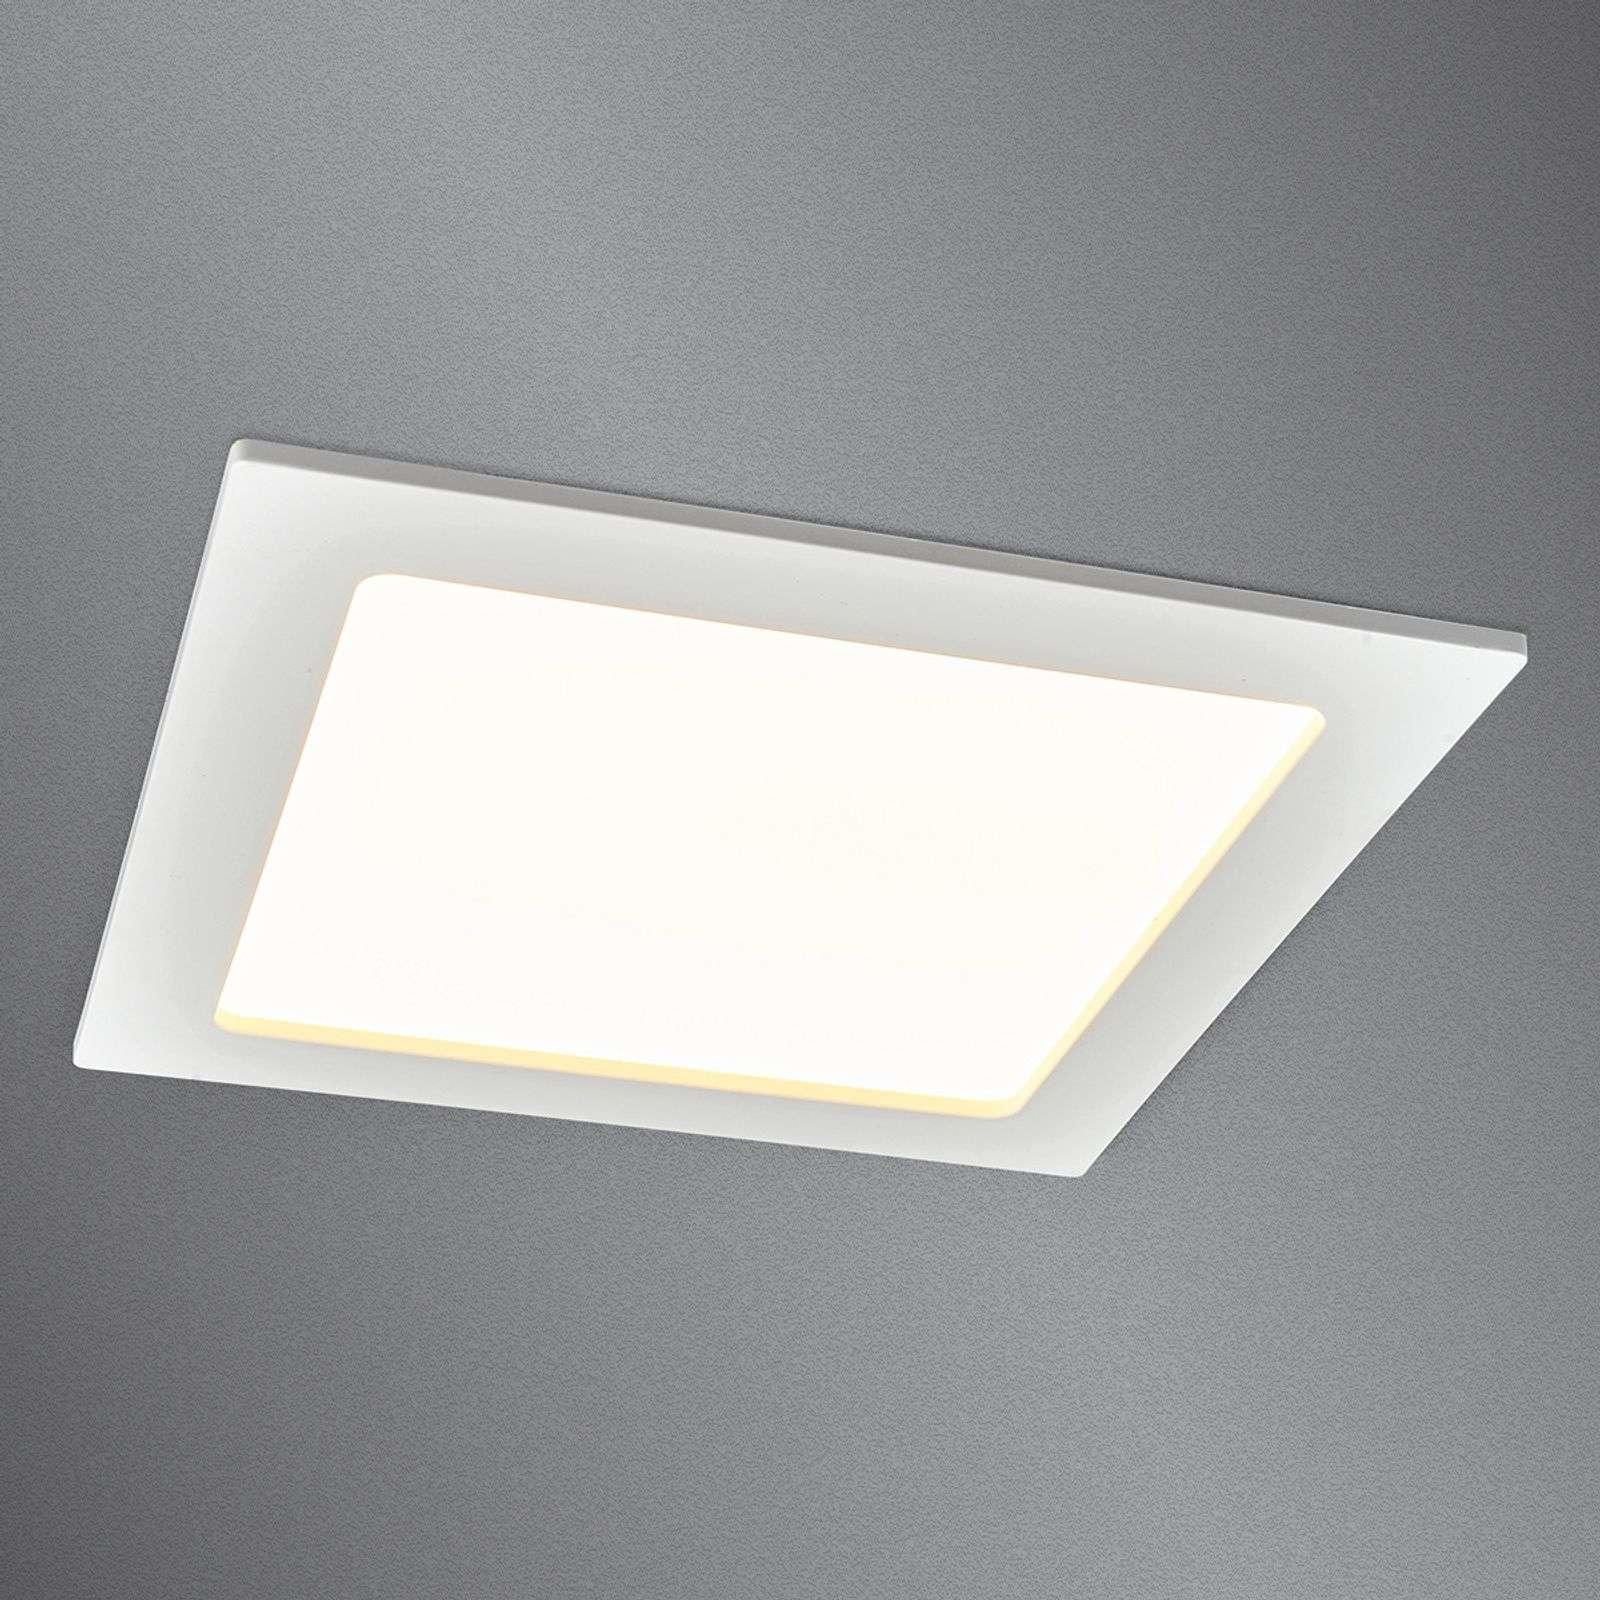 Lampenwelt.com Downlight LED Feva, salle de bains, IP44, 16W - LAMPENWELT.com